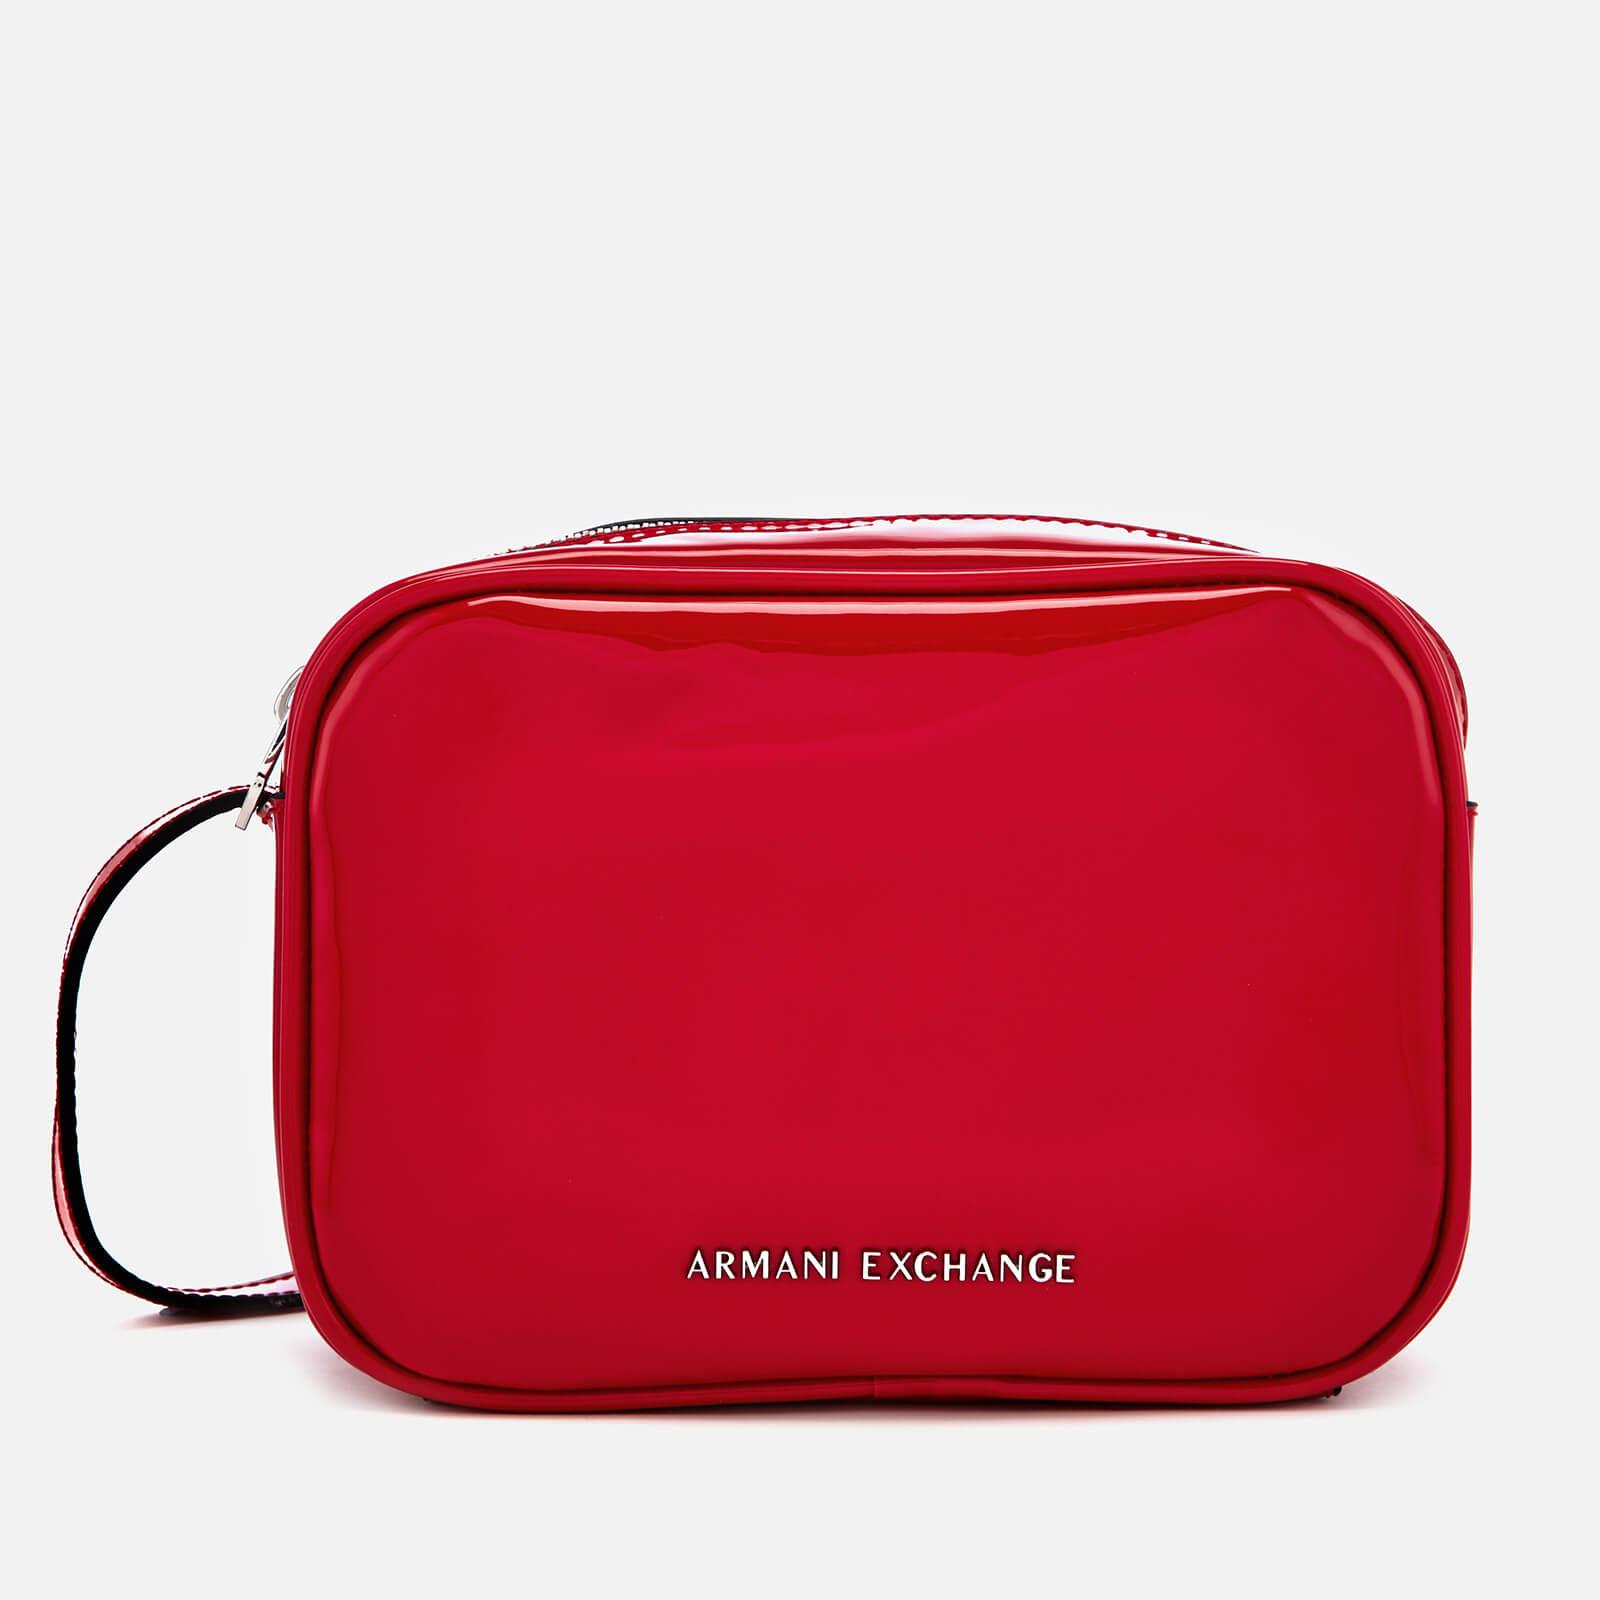 9c52318e Armani Exchange Women's Patent Logo Cross Body Bag - Red